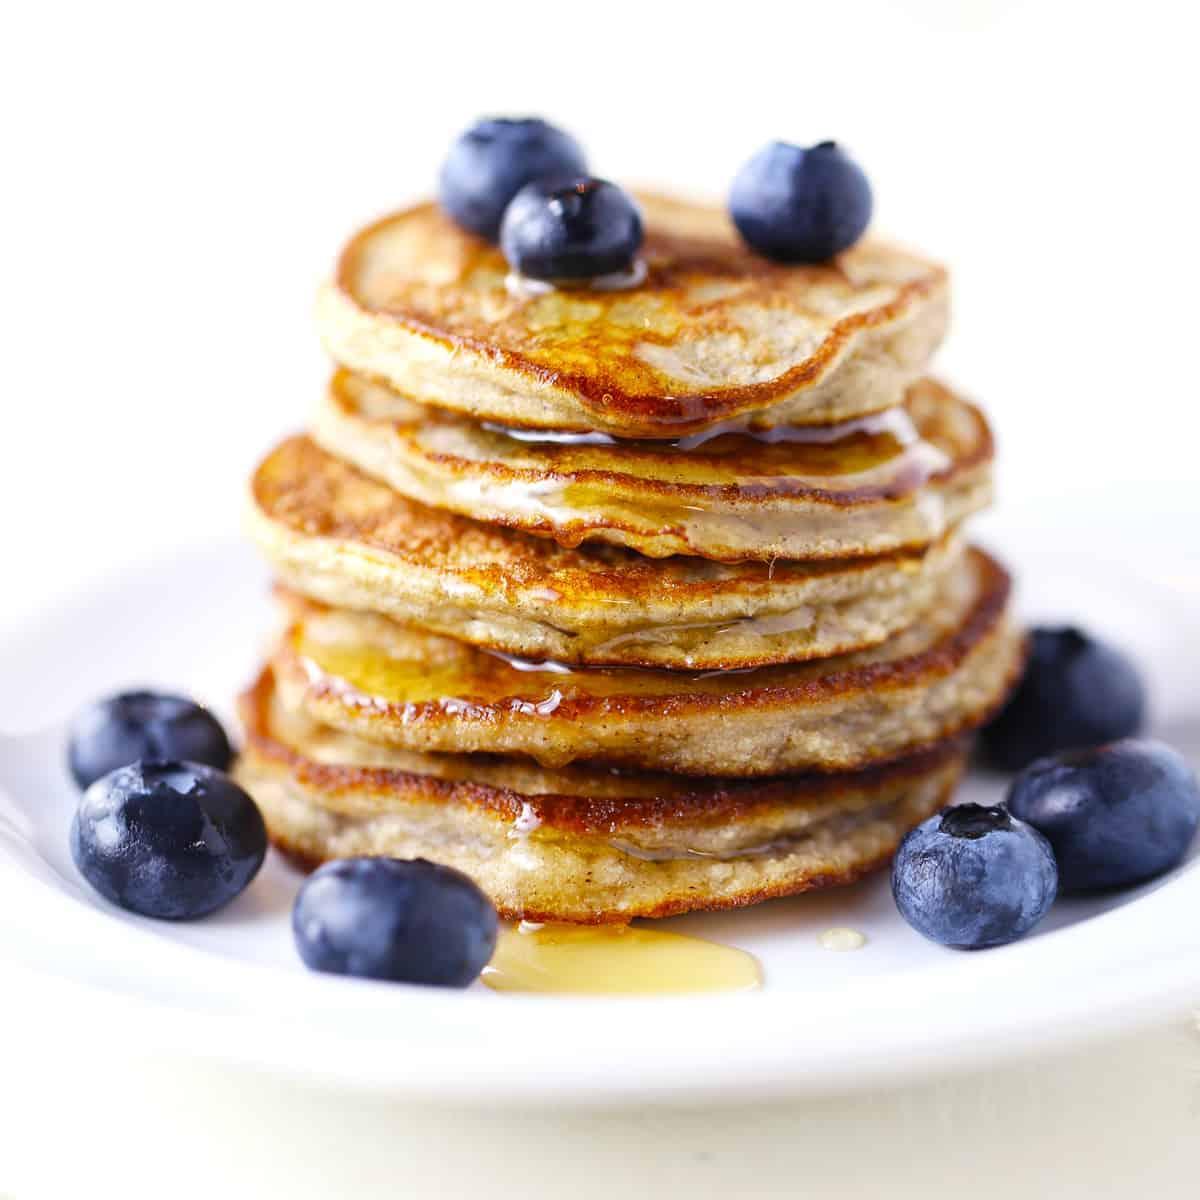 Gluten-free, dairy-free, paleo silver dollar pancakes